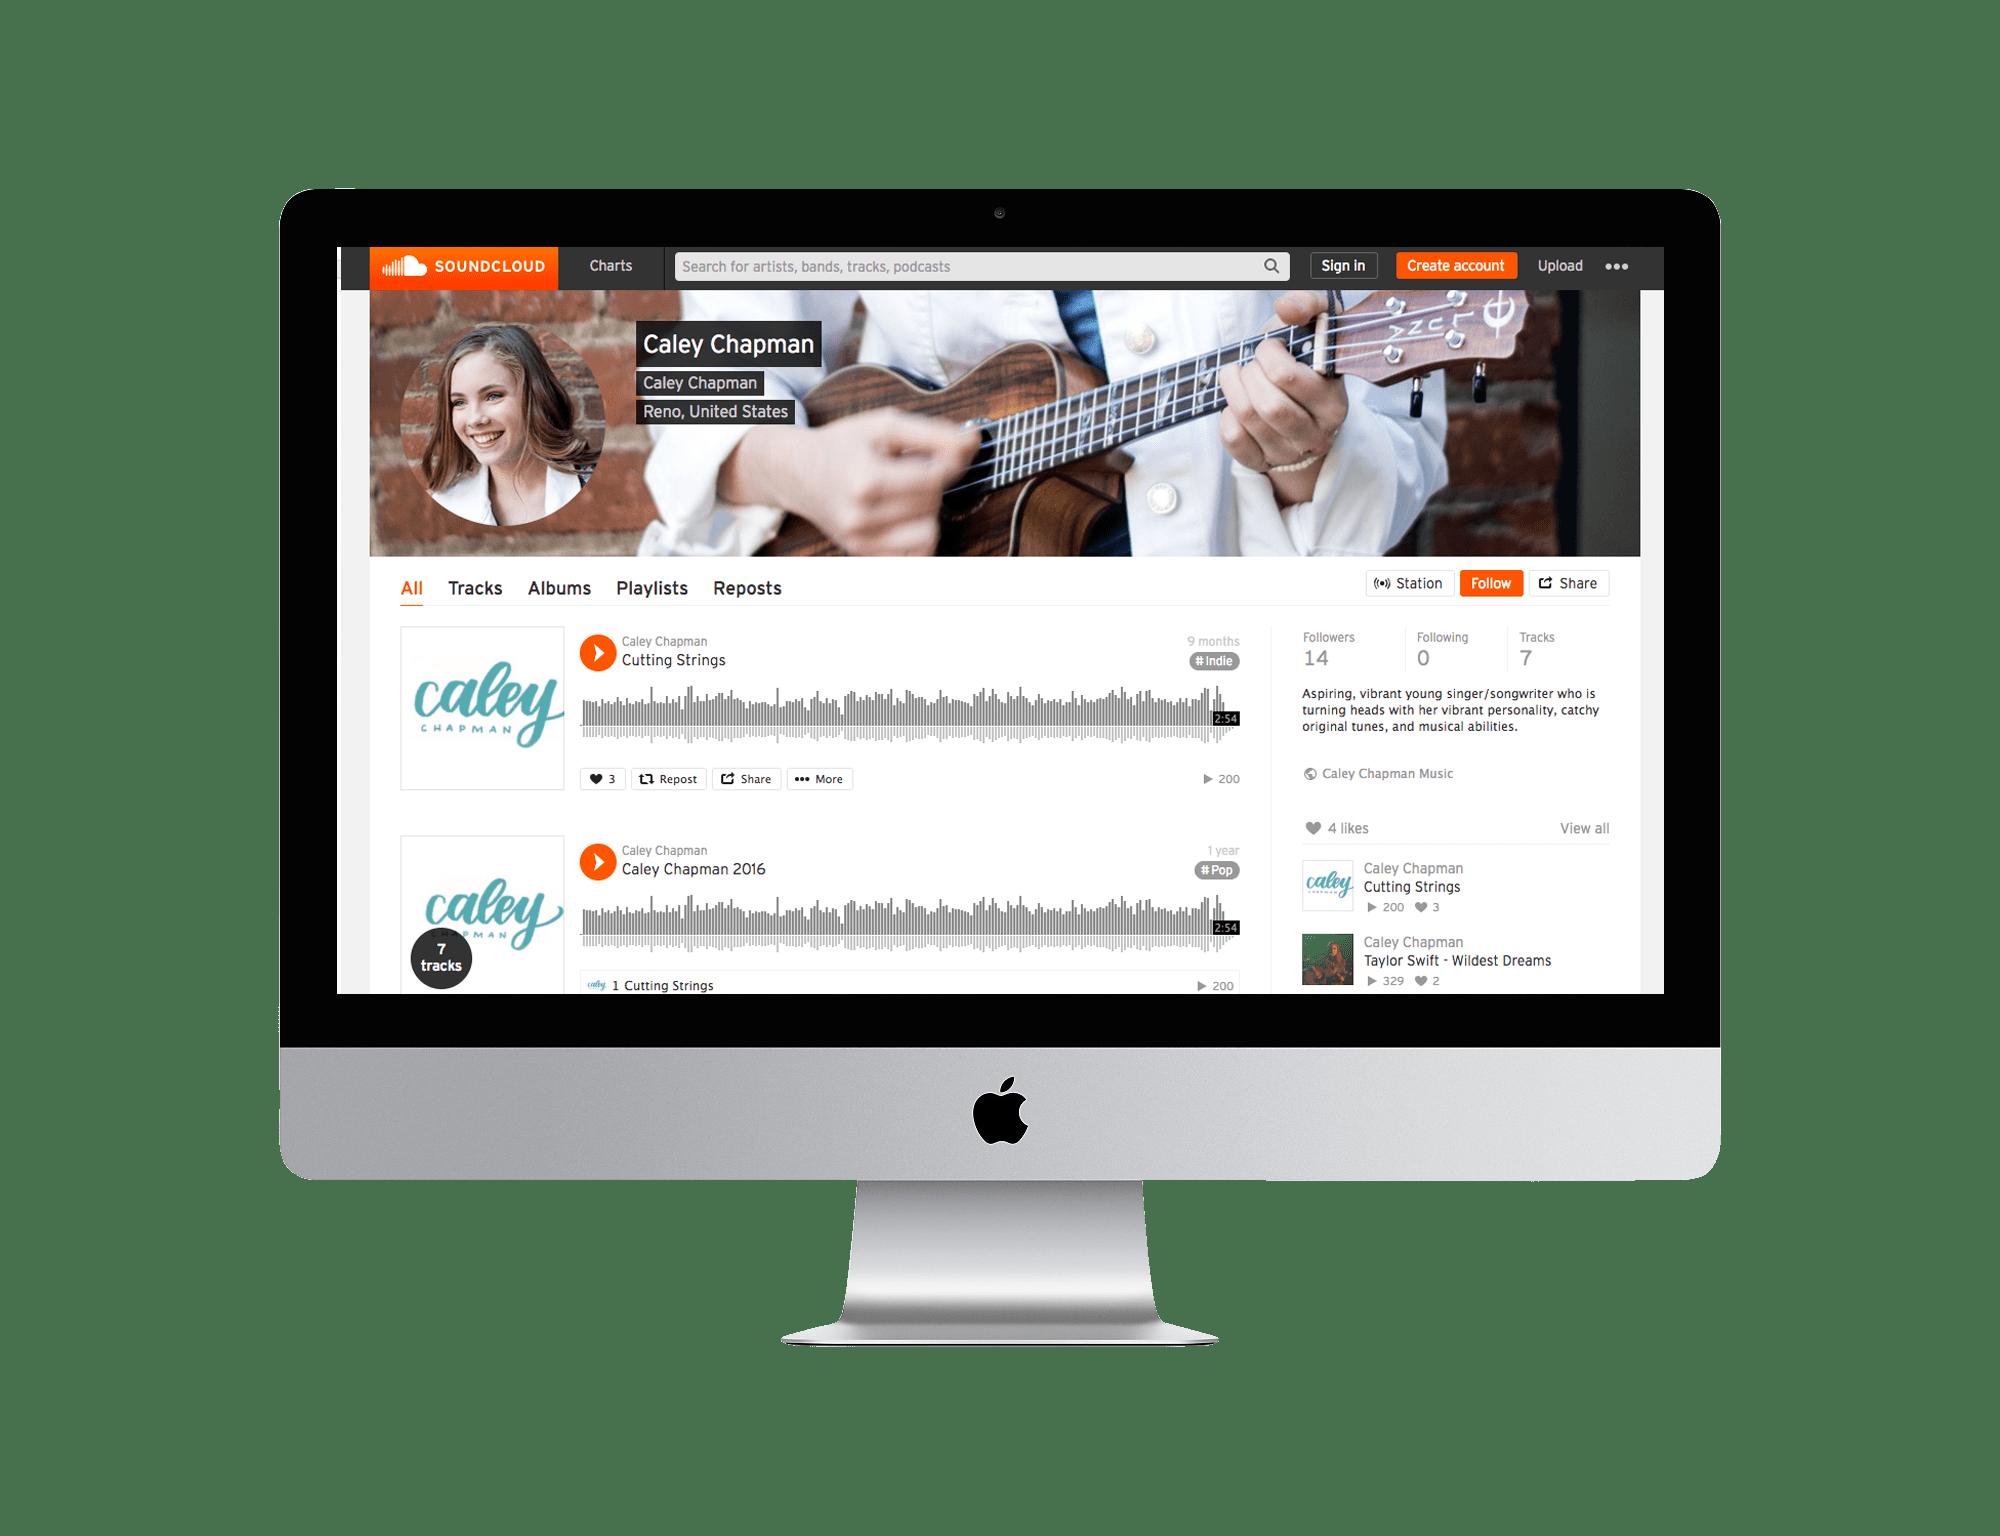 Caley Chapman Music Soundcloud